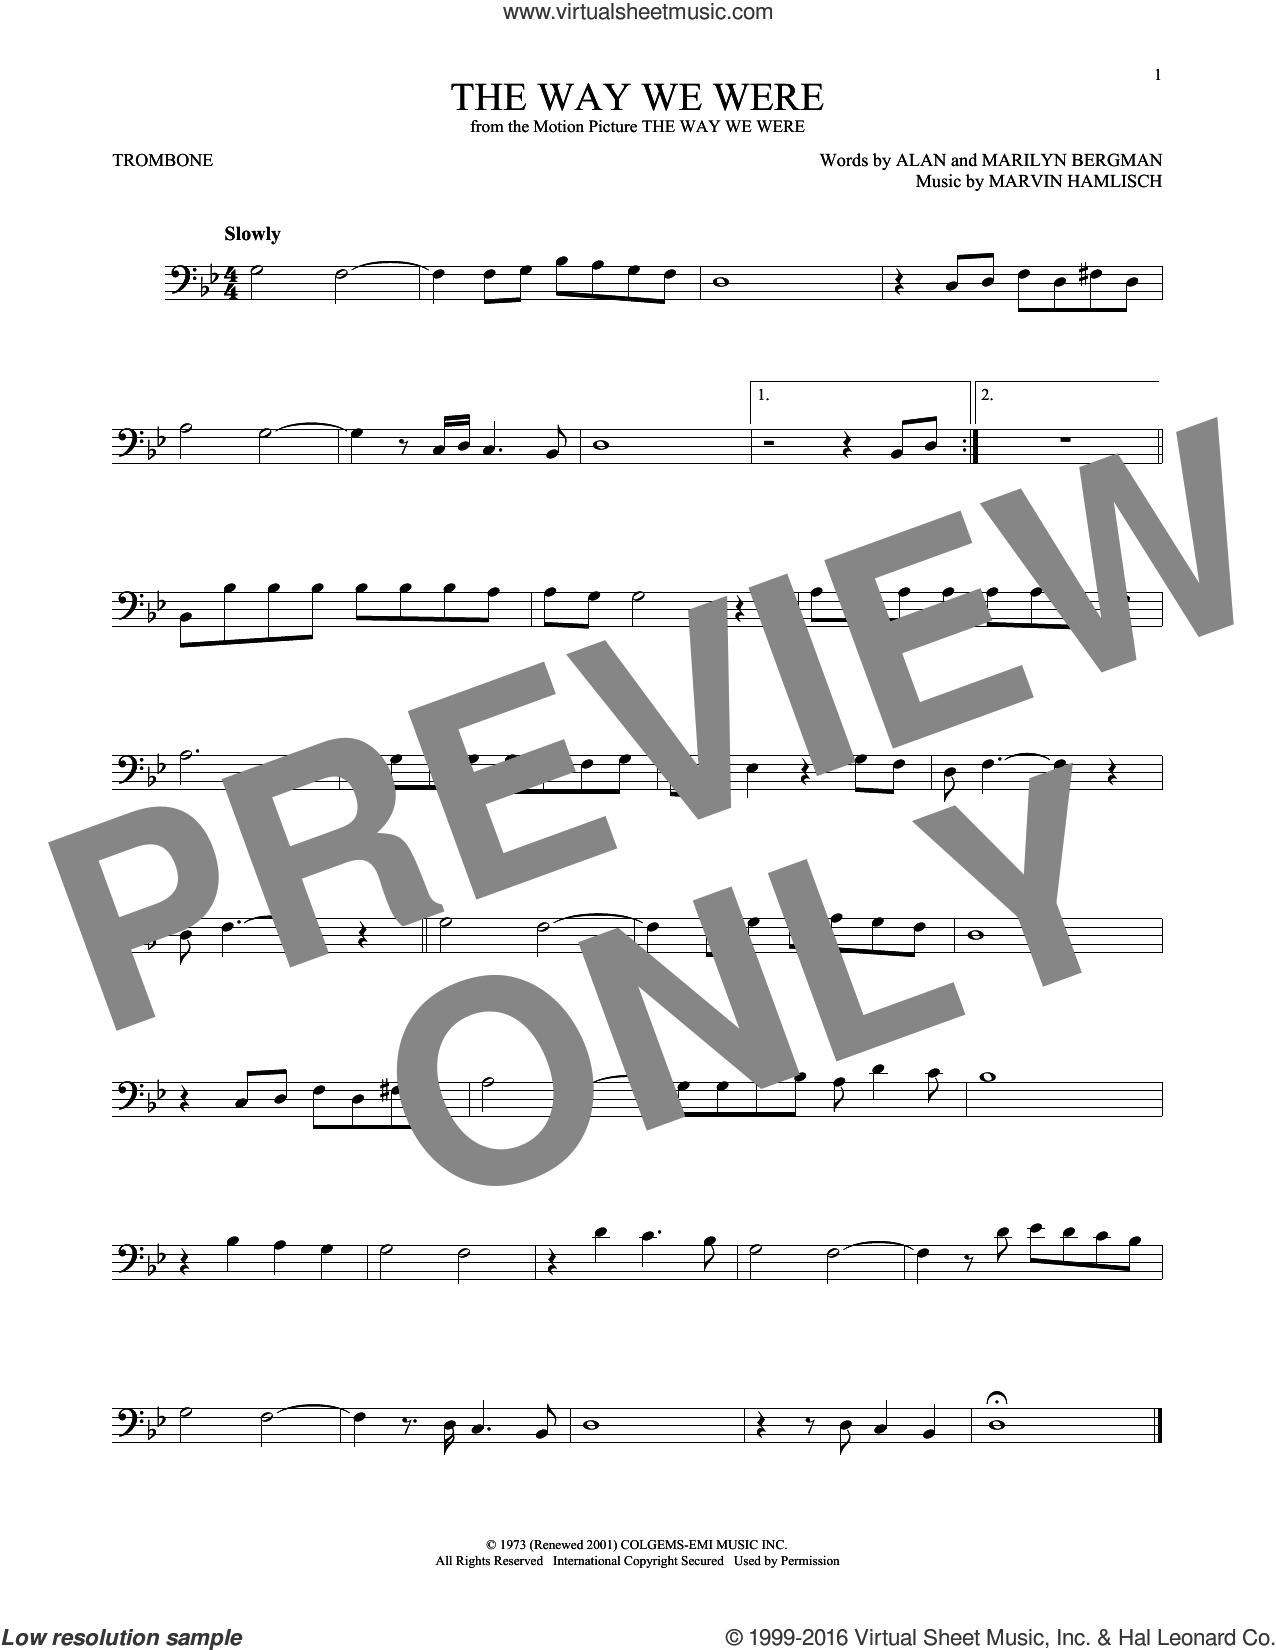 The Way We Were sheet music for trombone solo by Barbra Streisand, Alan Bergman, Marilyn Bergman and Marvin Hamlisch, intermediate skill level